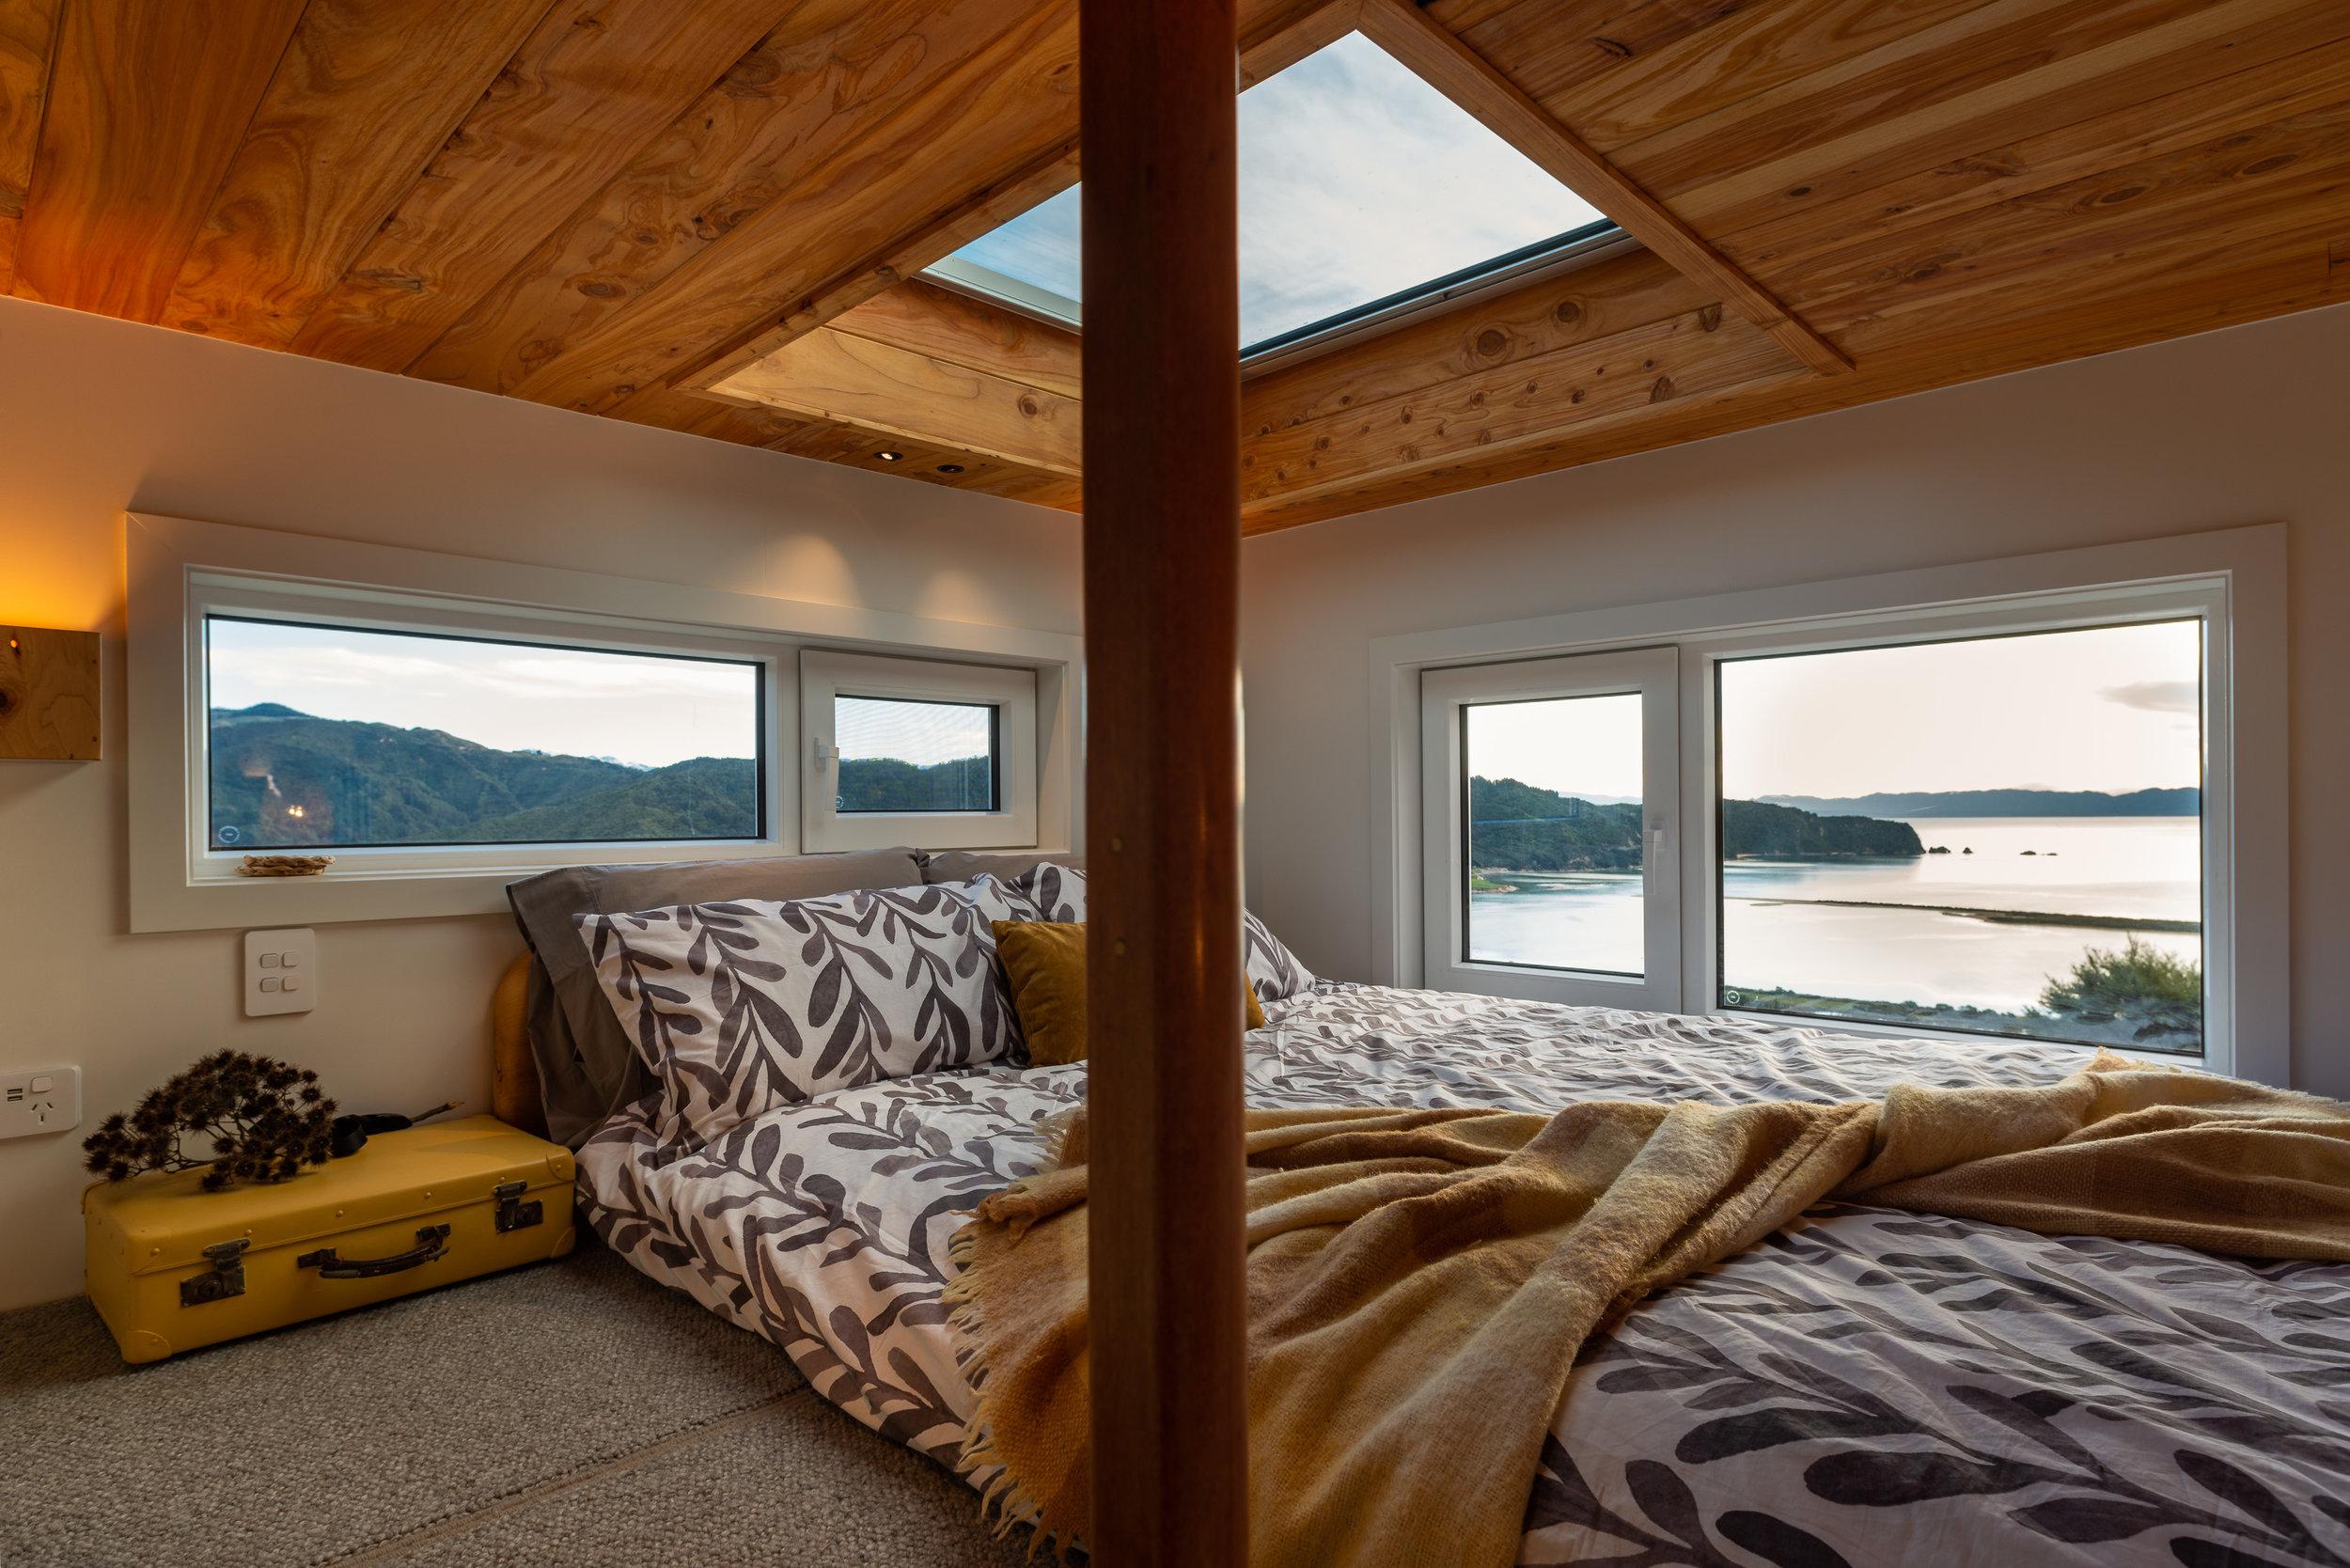 _OWP3221-tiny house bedroom.jpg